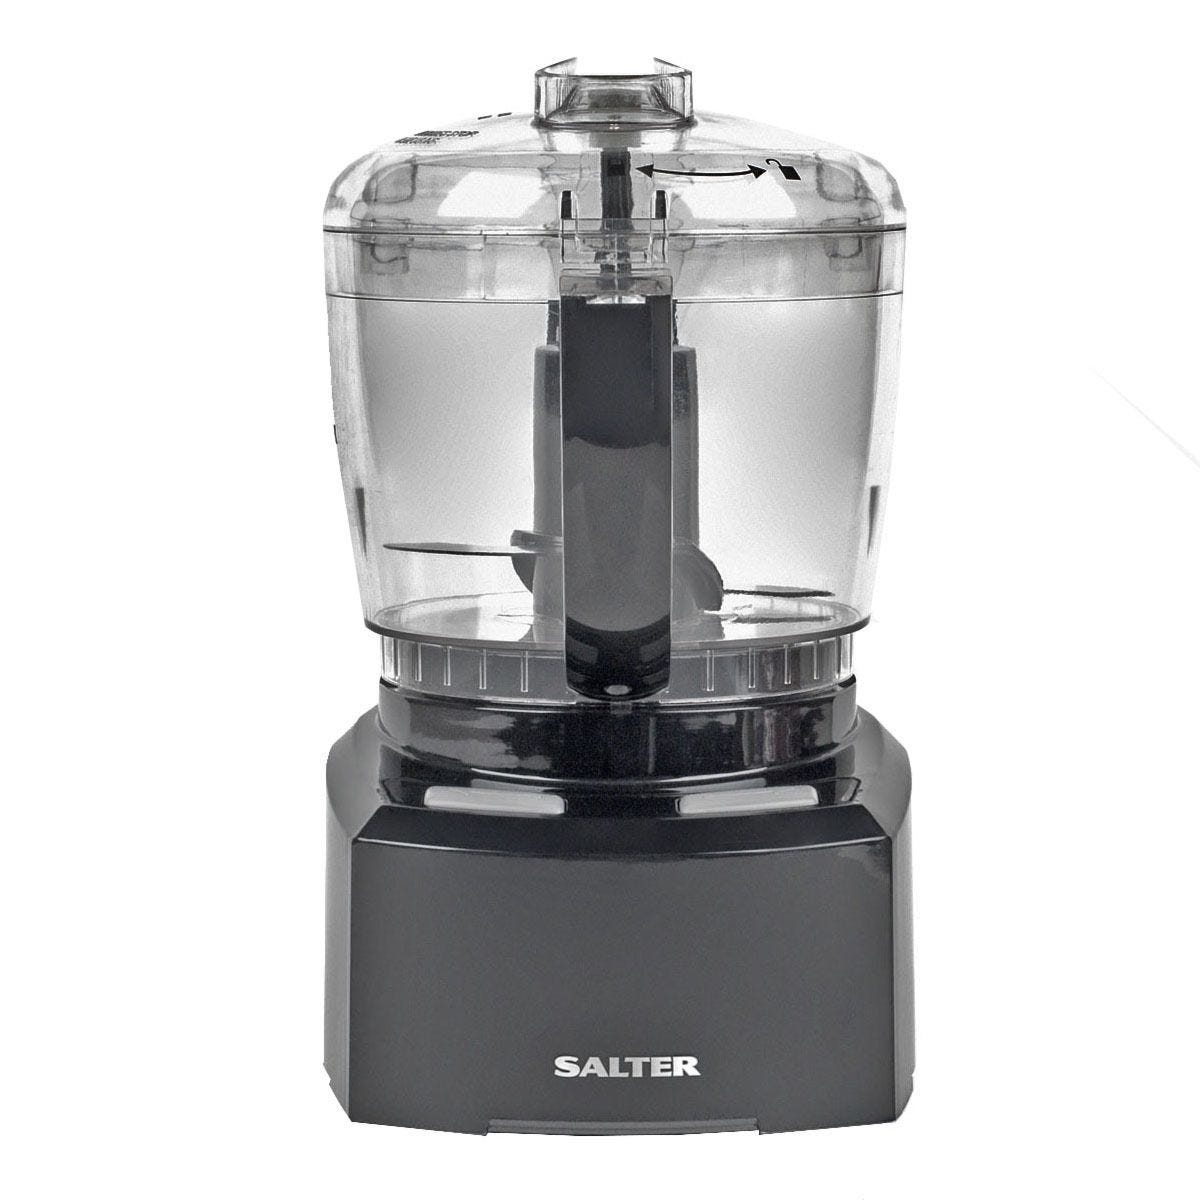 Salter EK3171 8-in-1 Compact Prep Pro Mini 200W Food Processor - Black